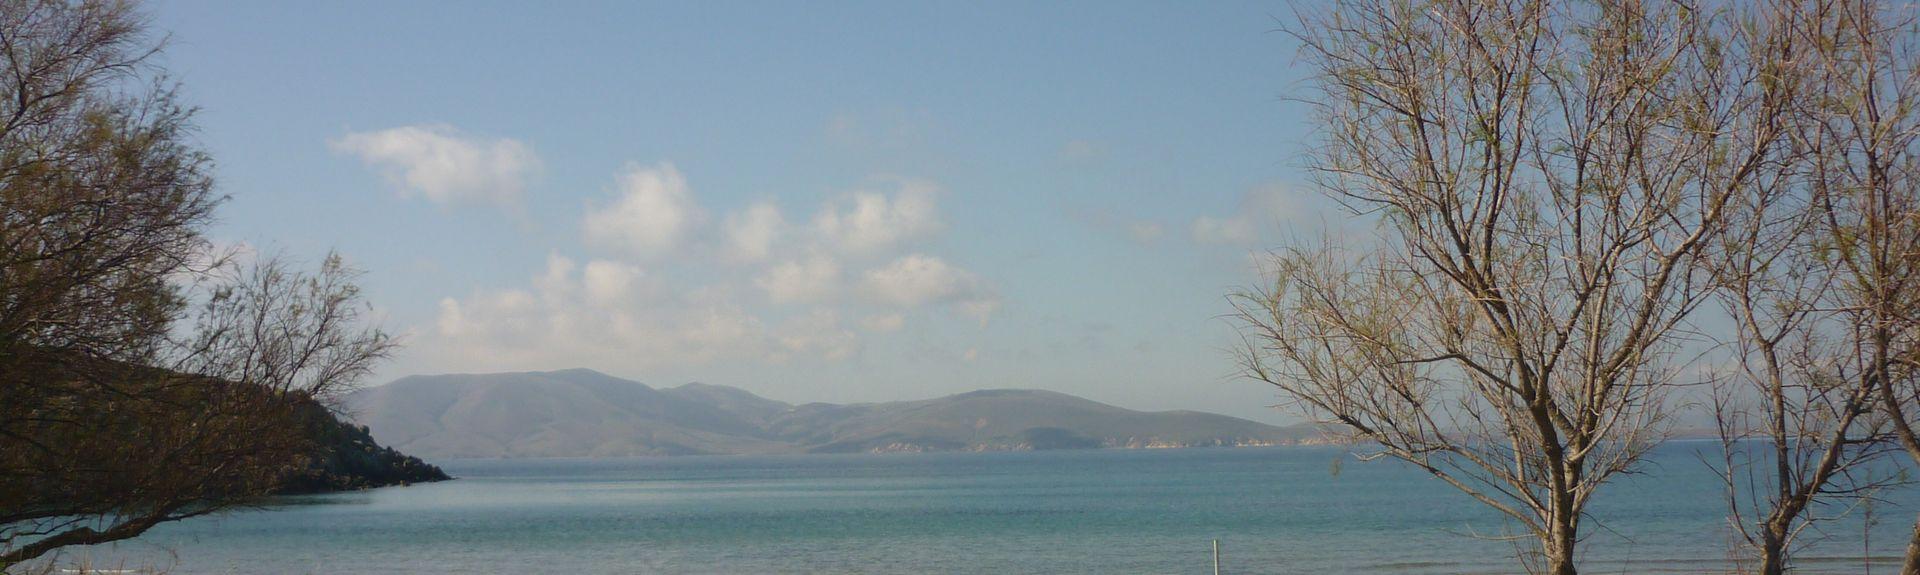 Mirina, Greece